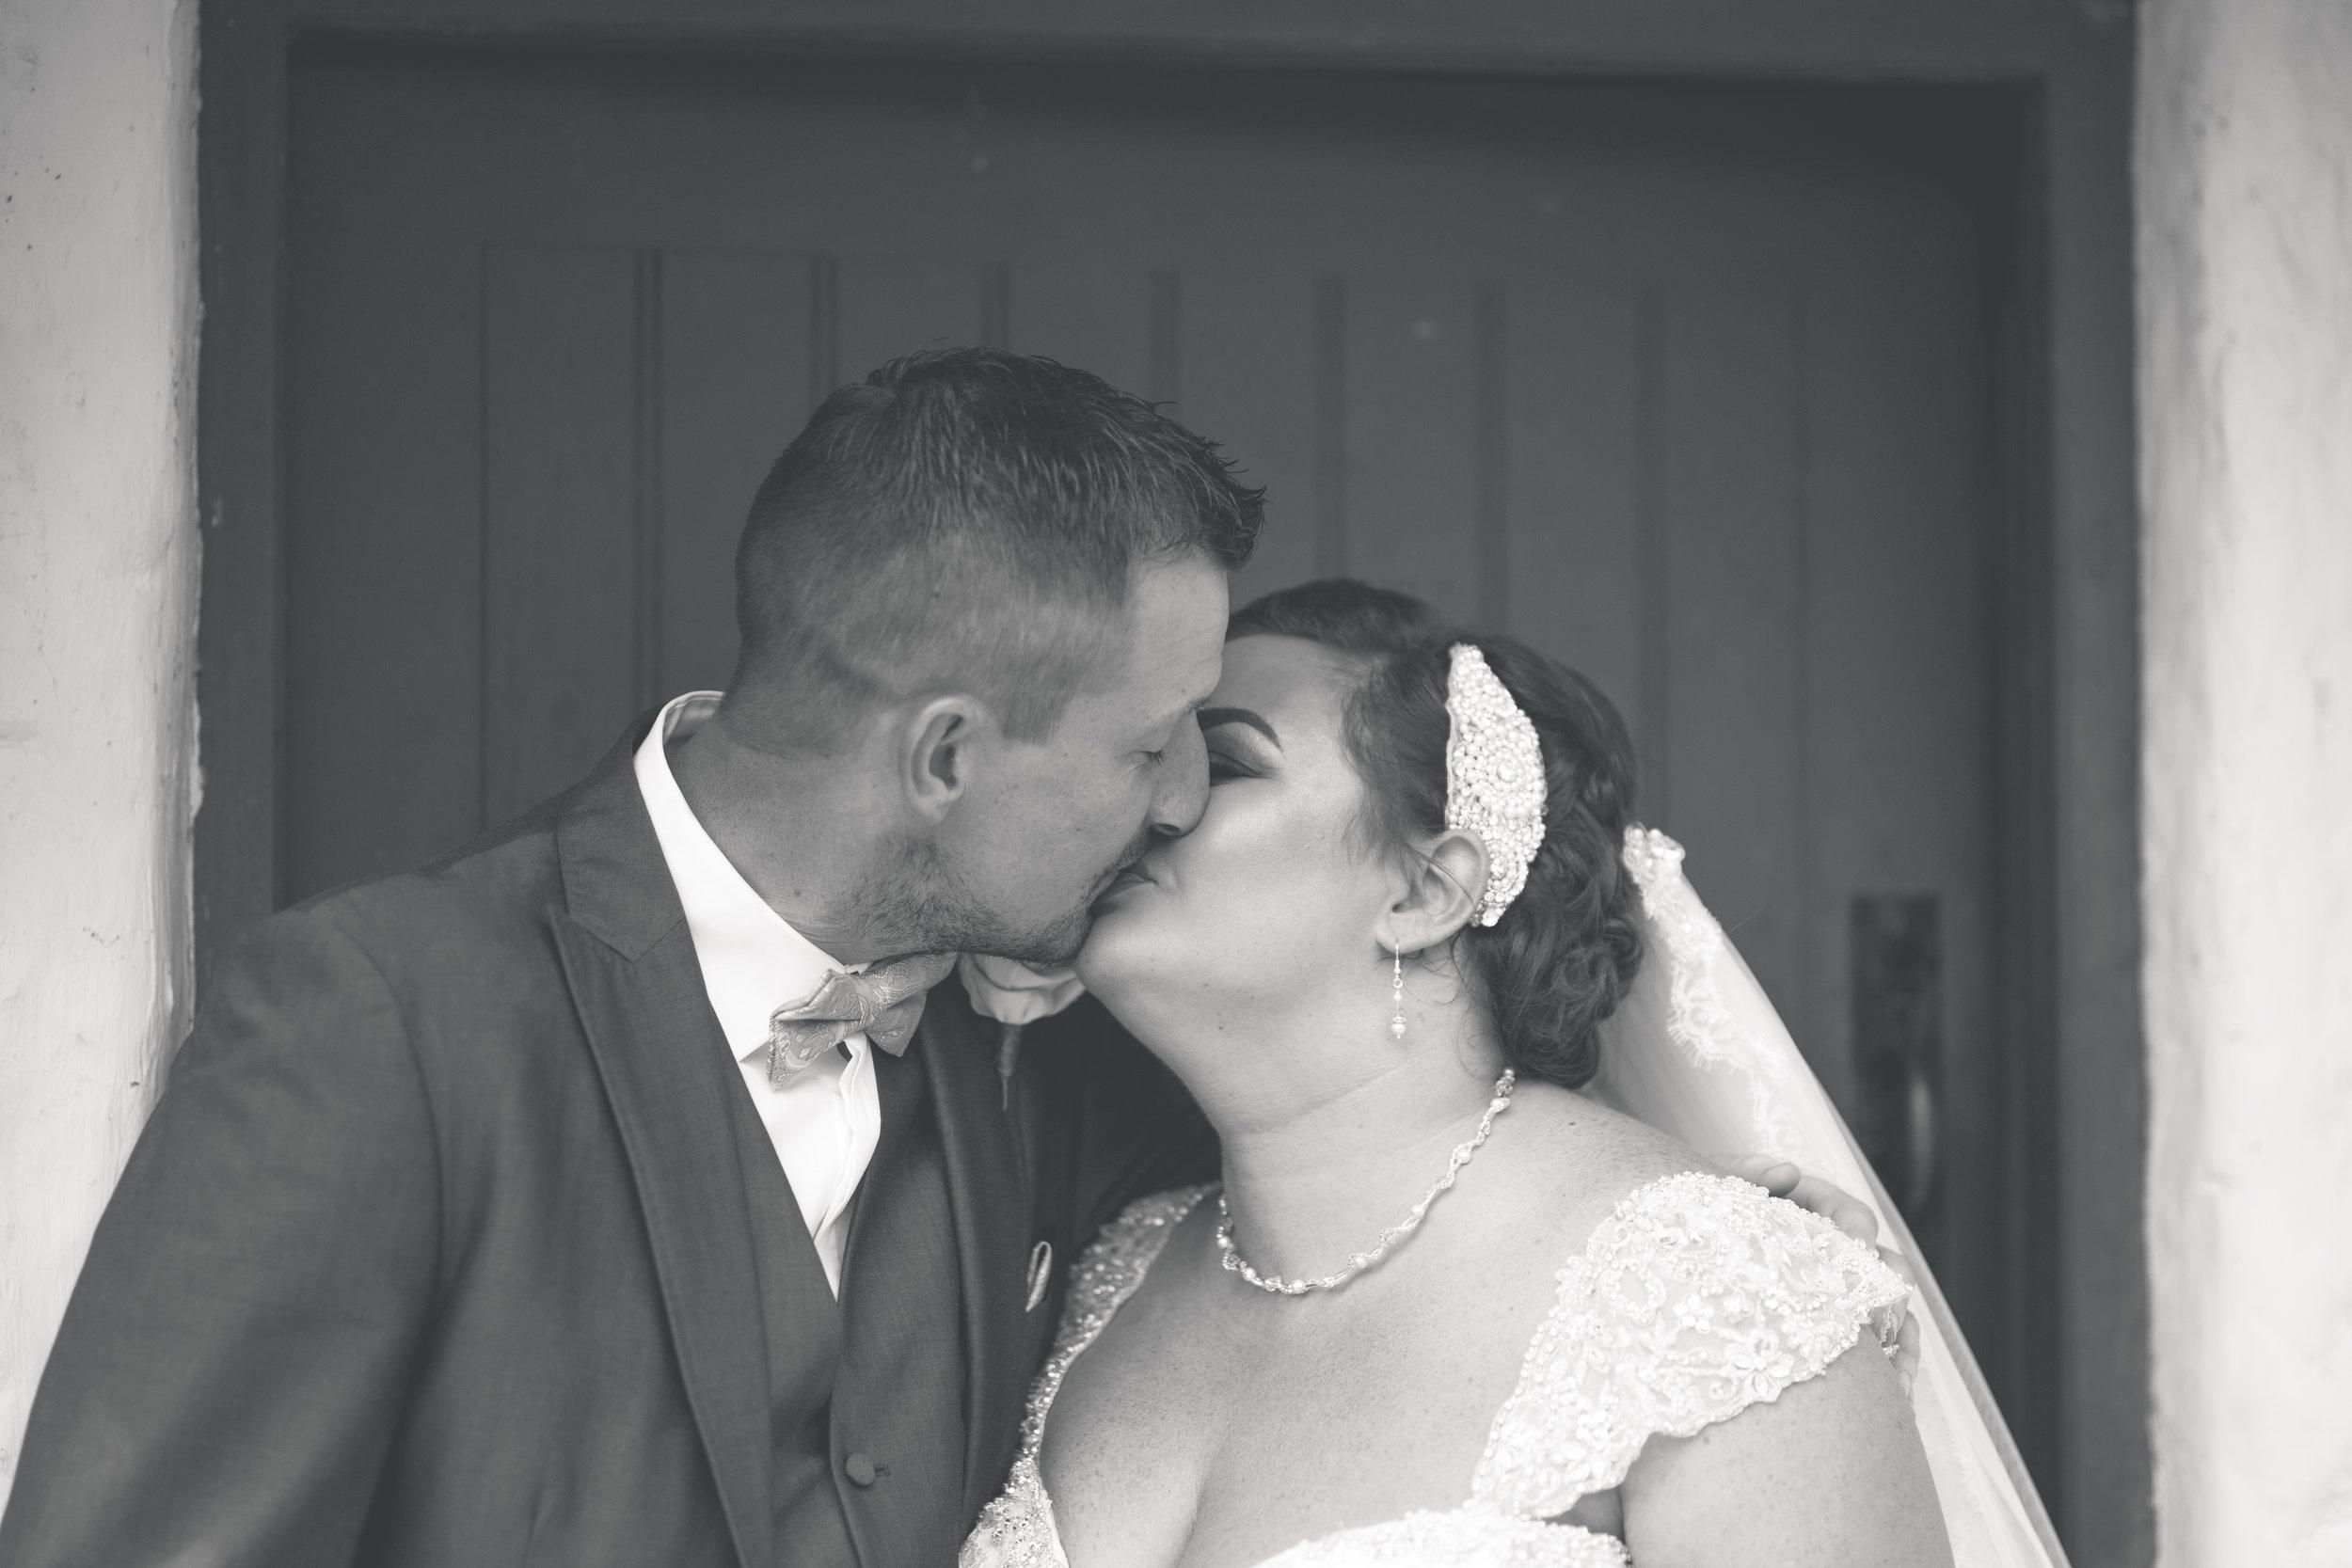 Antoinette & Stephen - Portraits   Brian McEwan Photography   Wedding Photographer Northern Ireland 8.jpg